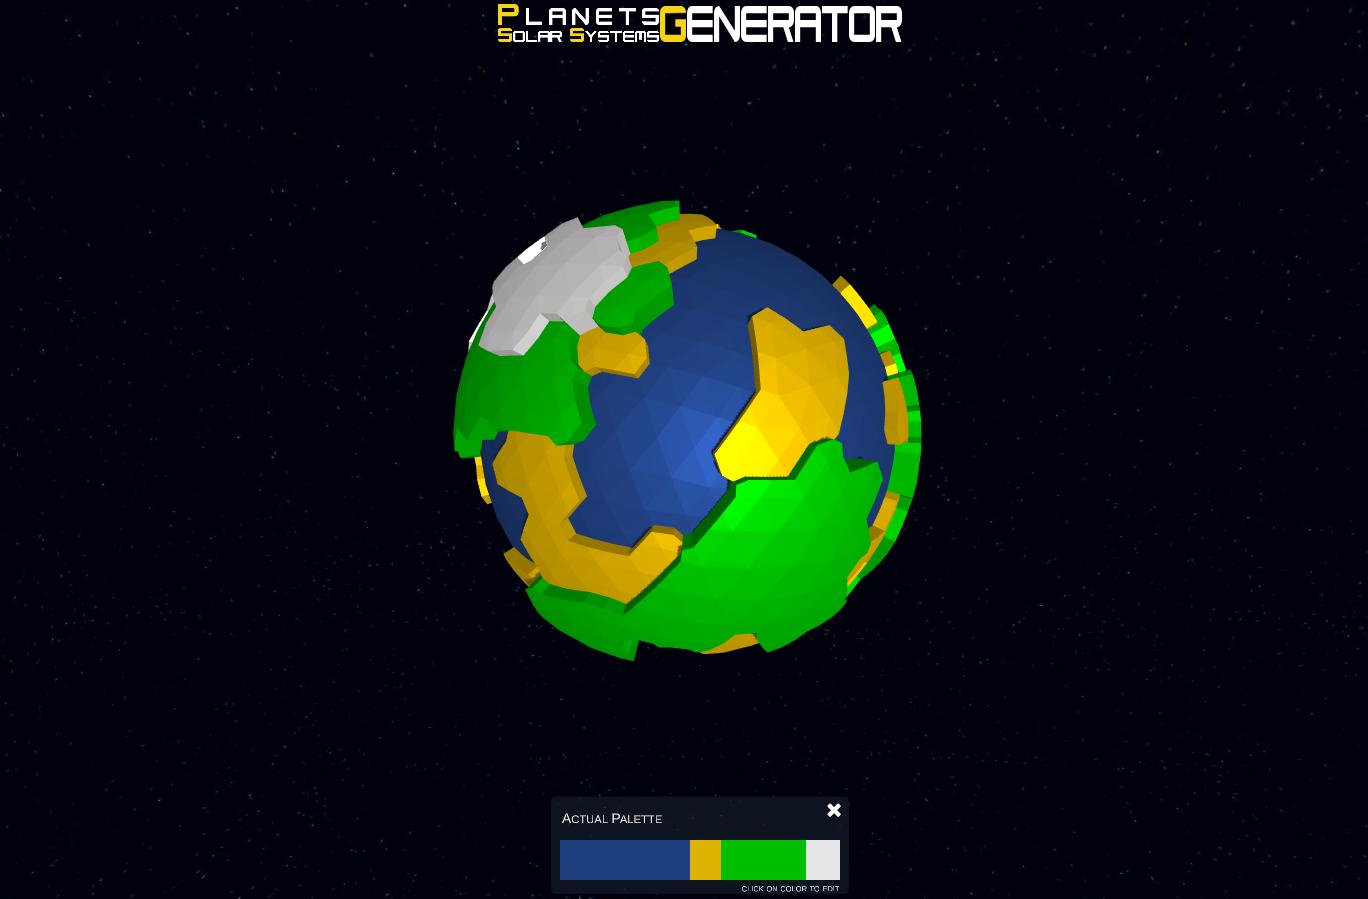 Planets & Solar Systems Generator by Artur Majcher